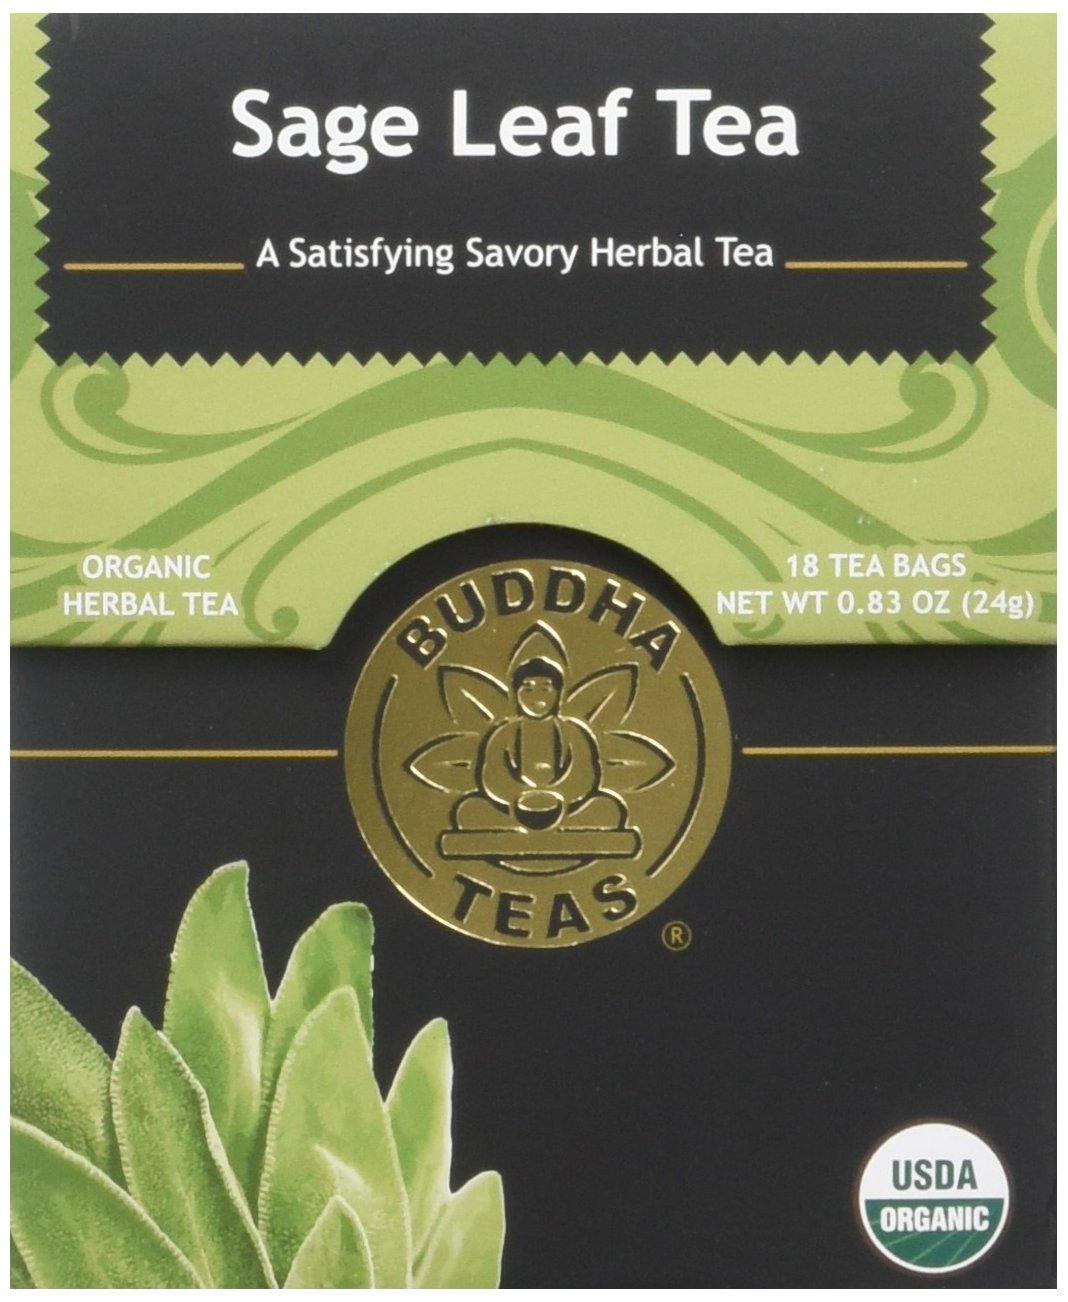 Organic Sage Leaf Tea - Kosher, Caffeine-Free, GMO-Free - 18 Bleach-Free Tea Bags